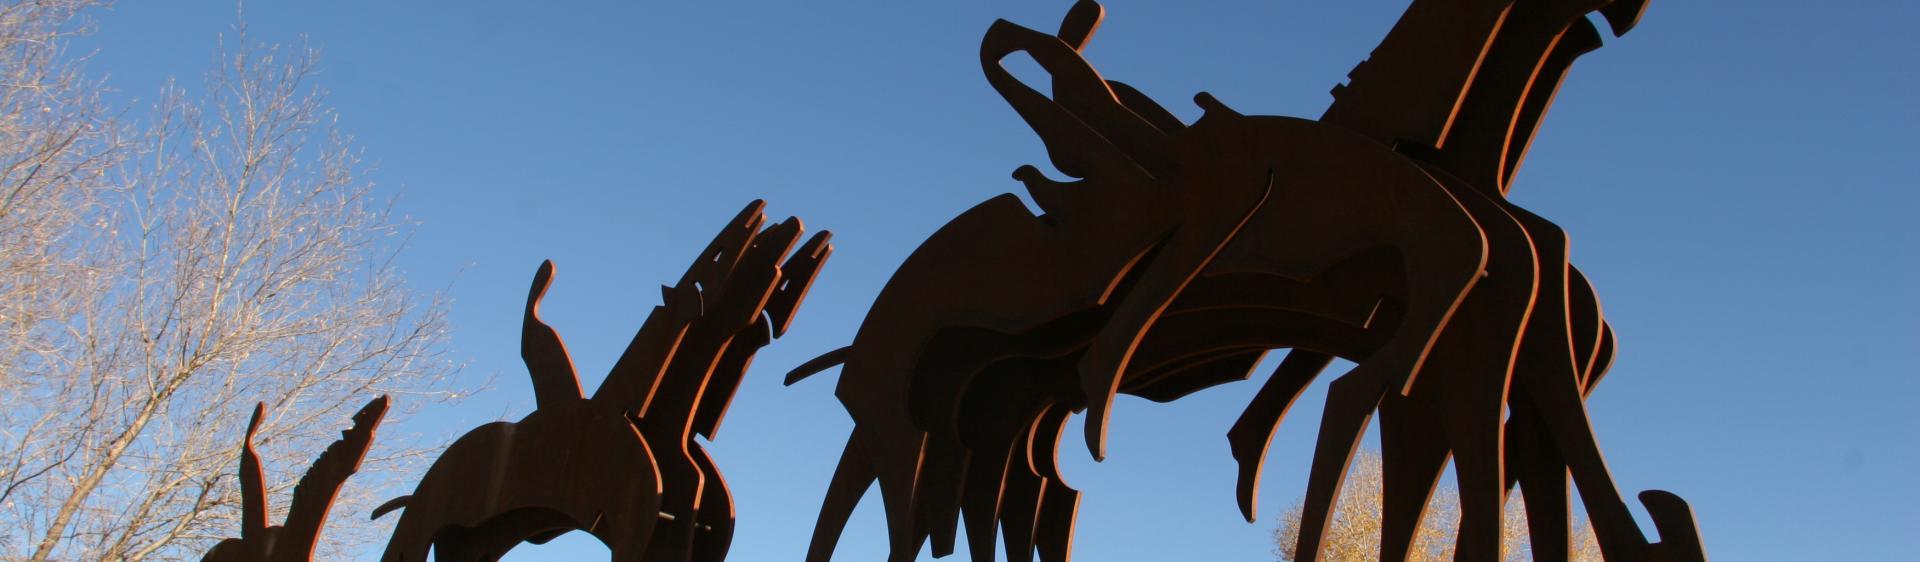 Parade Formation Sculpture